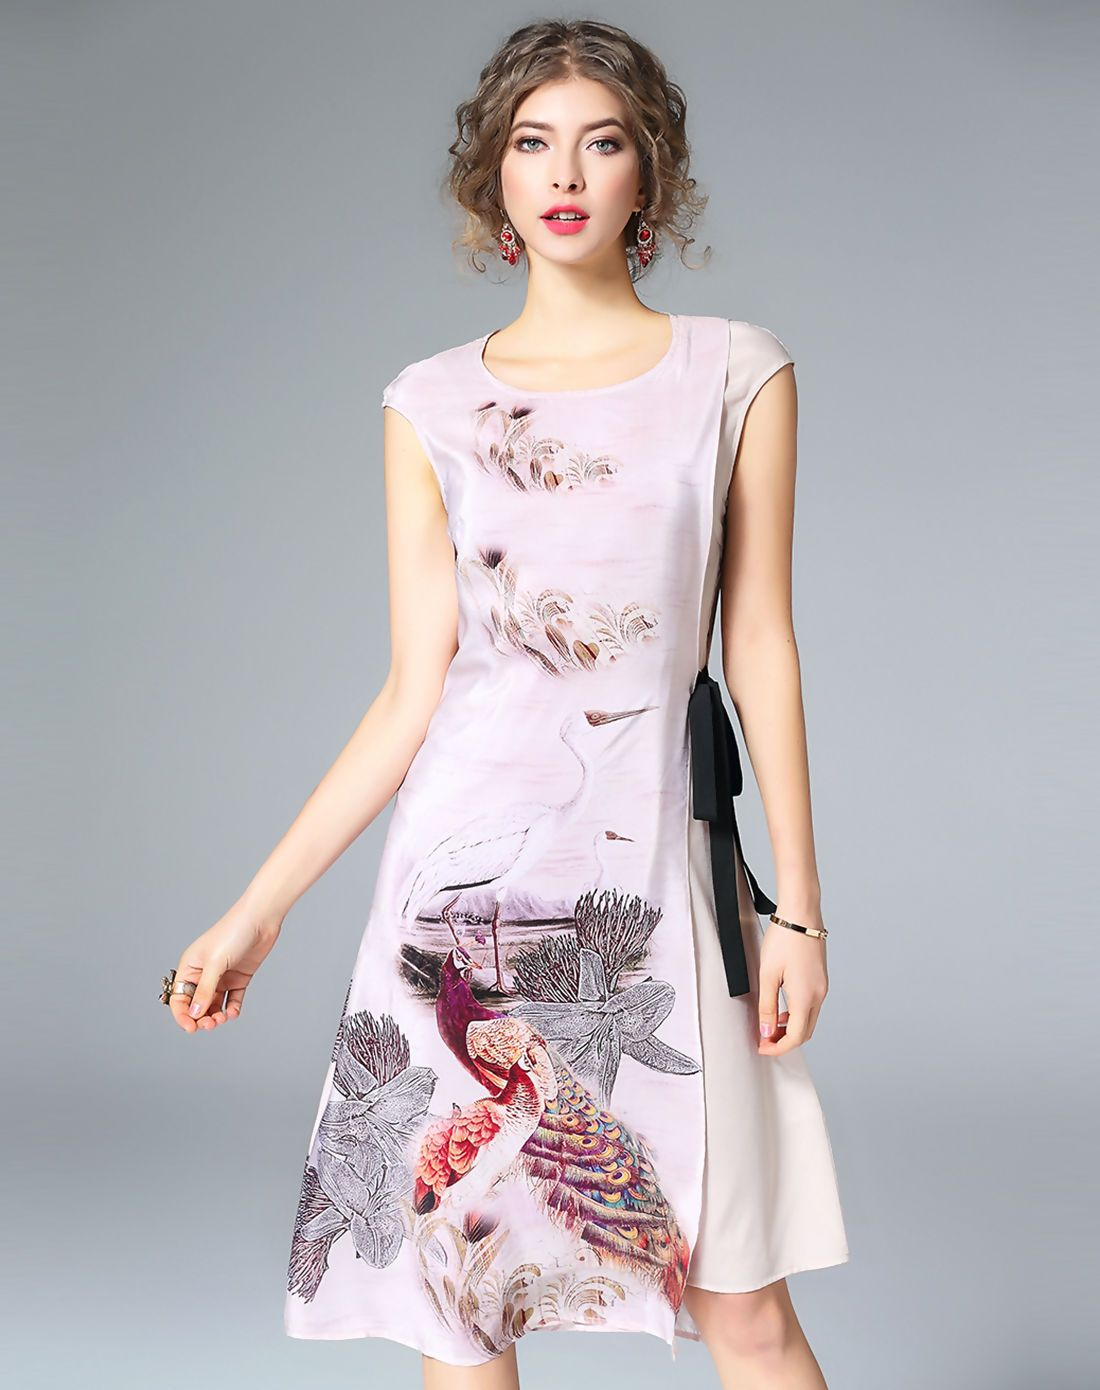 Vipme silk cap sleeve bird printed elegant midi dress get more